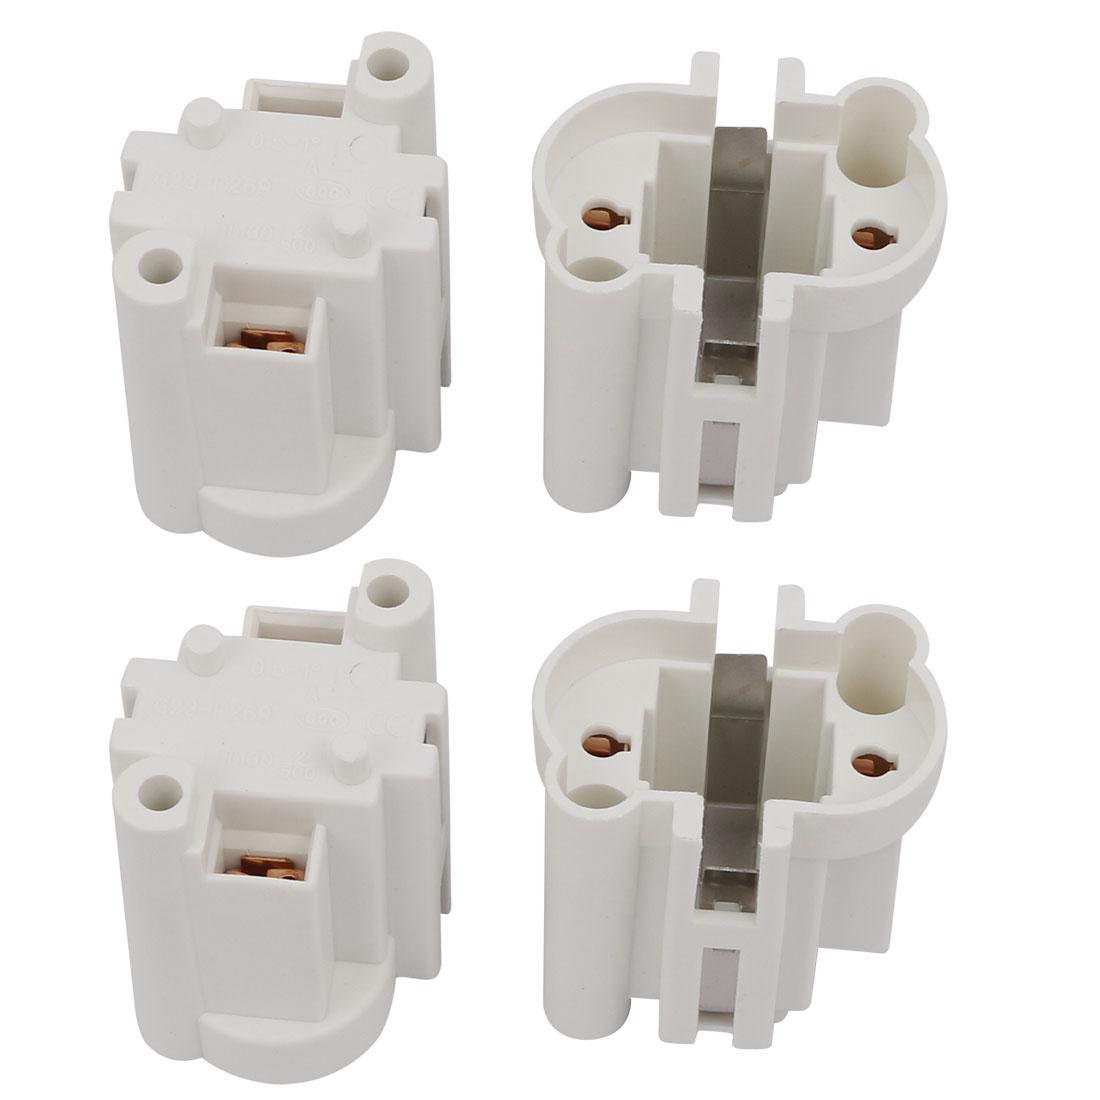 4Pcs G23-F269 AC 500V 2A Light Socket Base Fluorescent PL Tube Lamp Holder